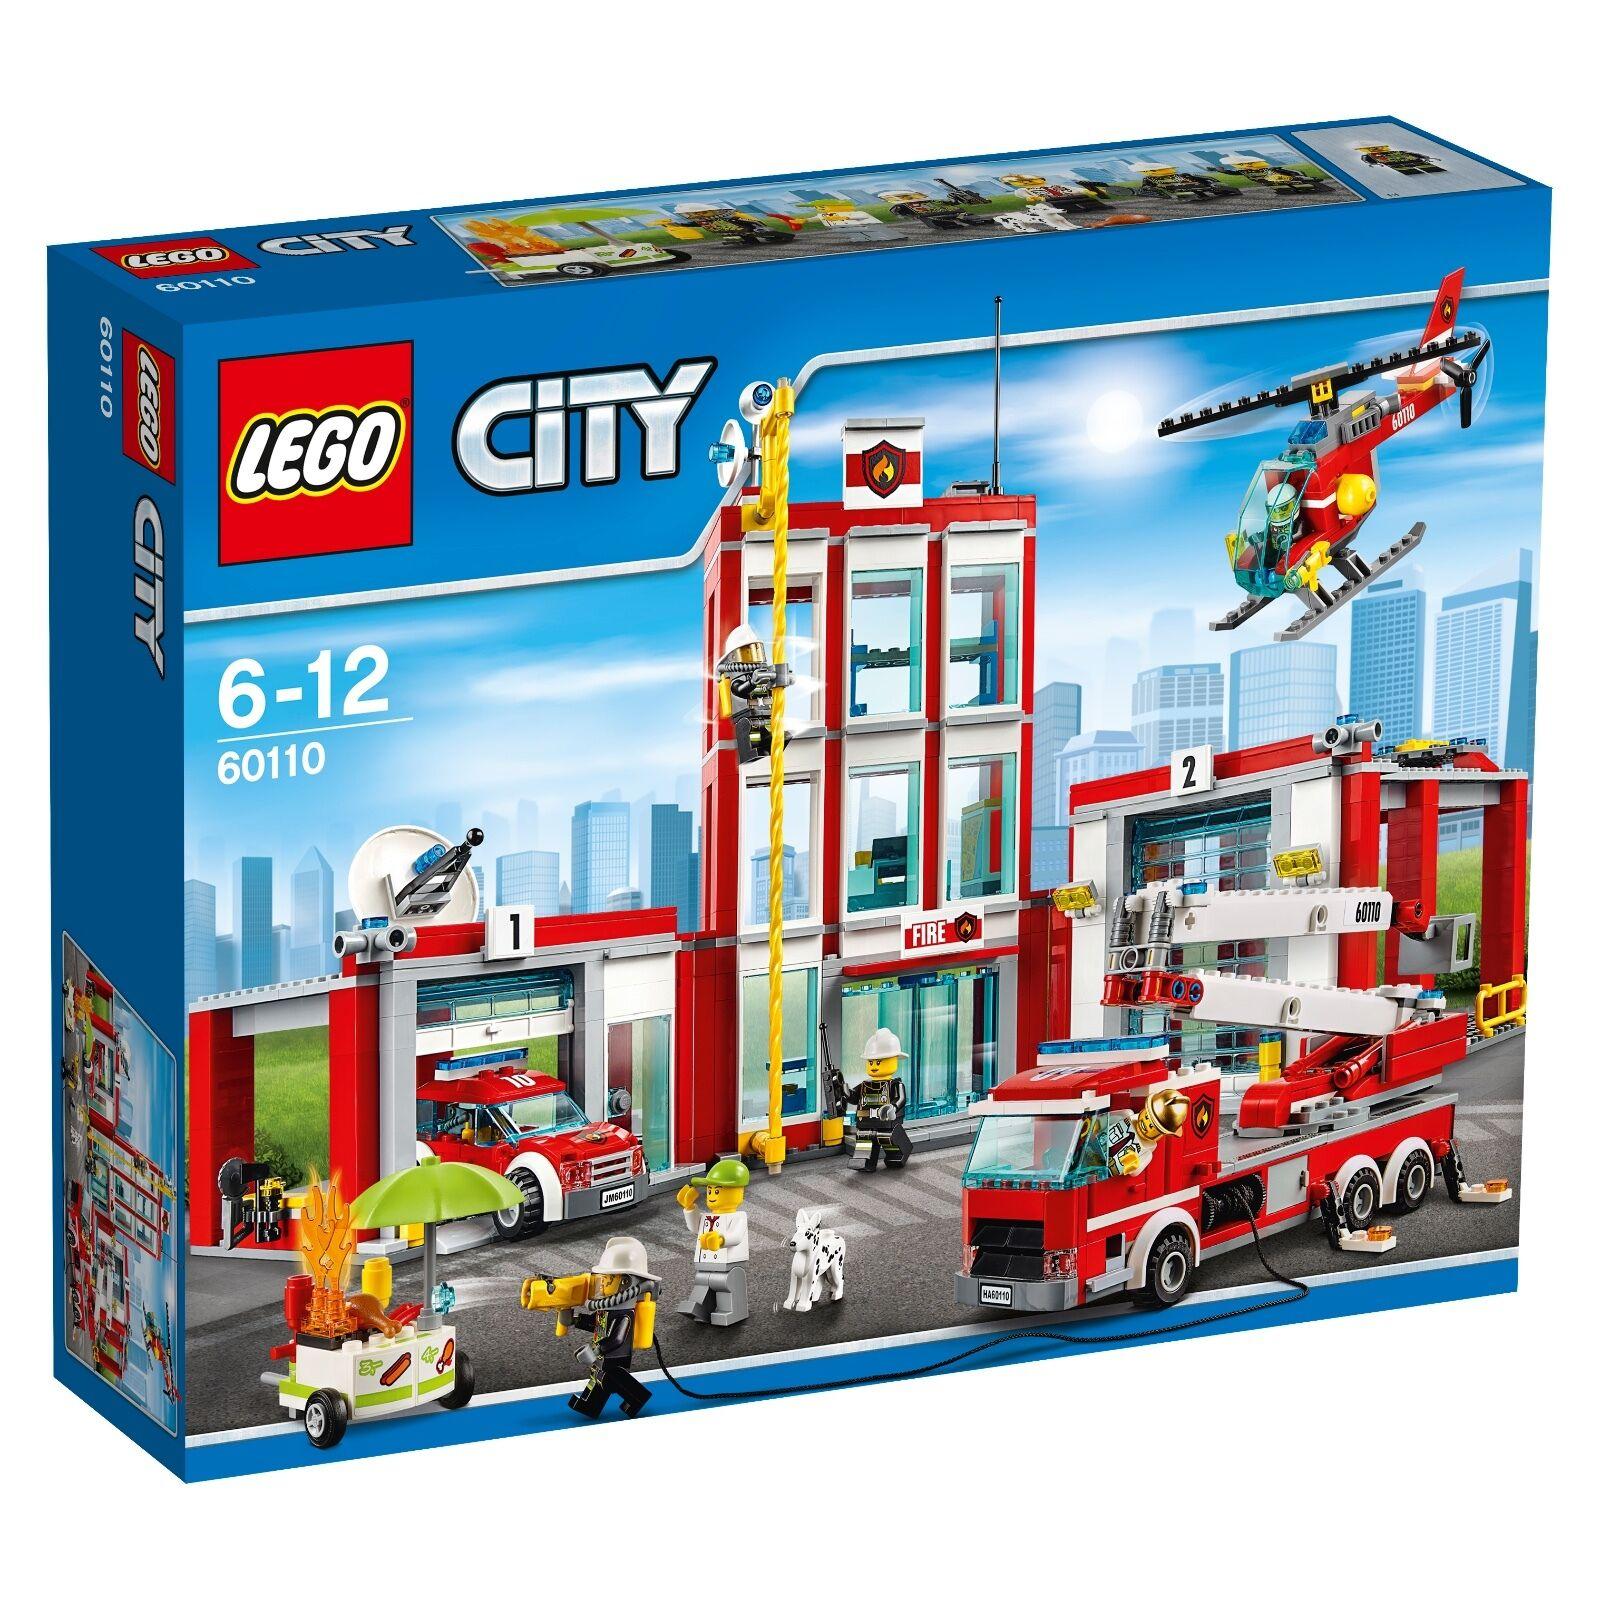 LEGO ® City 60110 grandi Stazione Pompieri NUOVO OVP _ Fire Station NEW MISB NRFB